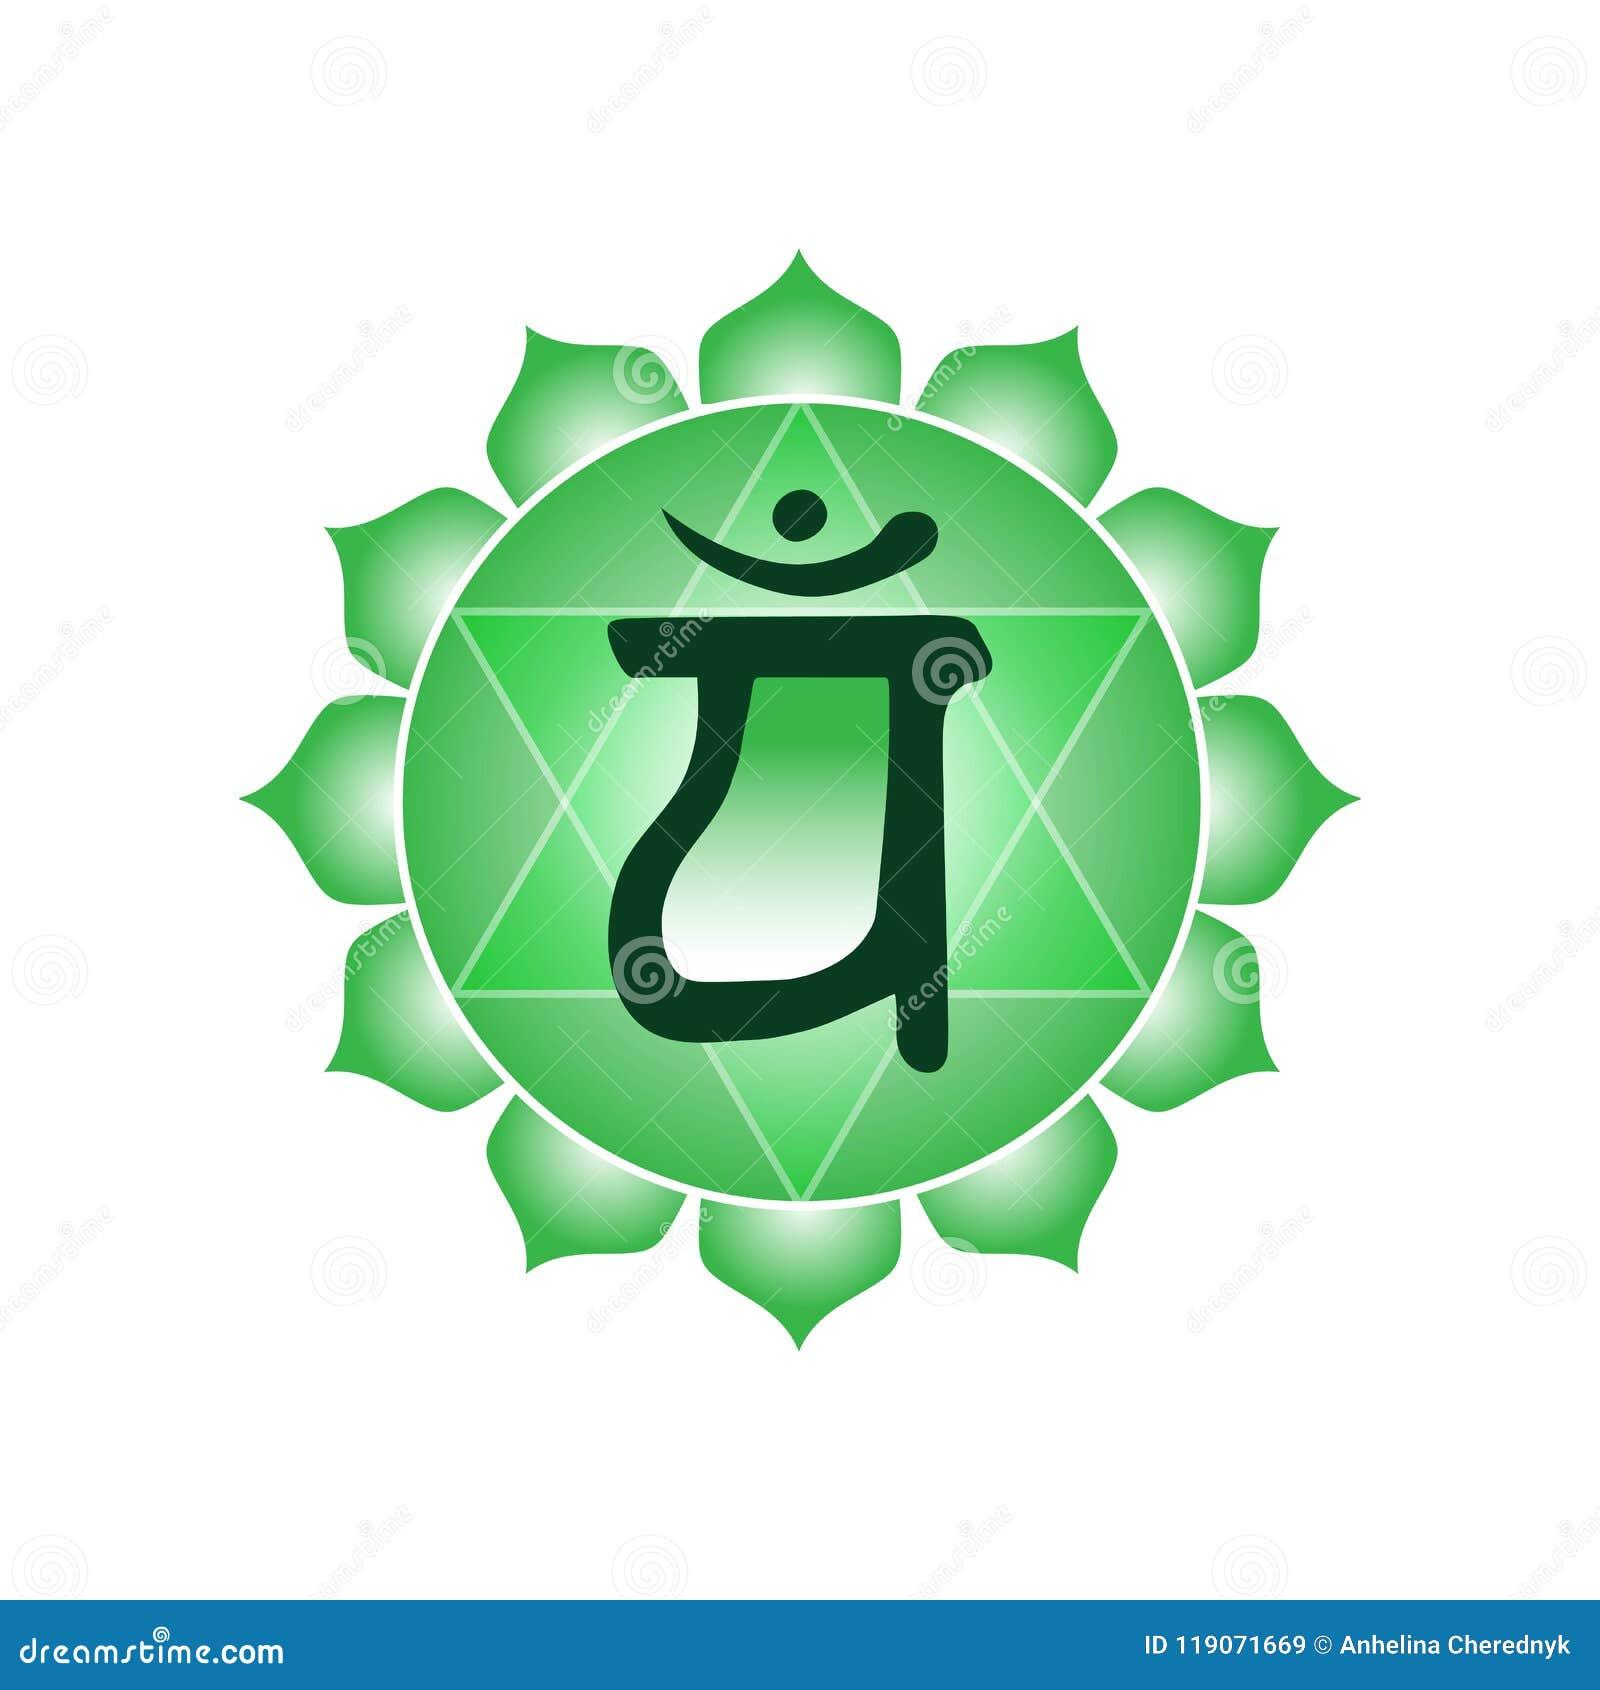 Hinduis indios del buddhism de la yoga esotérica del símbolo del icono del chakra de Anahata